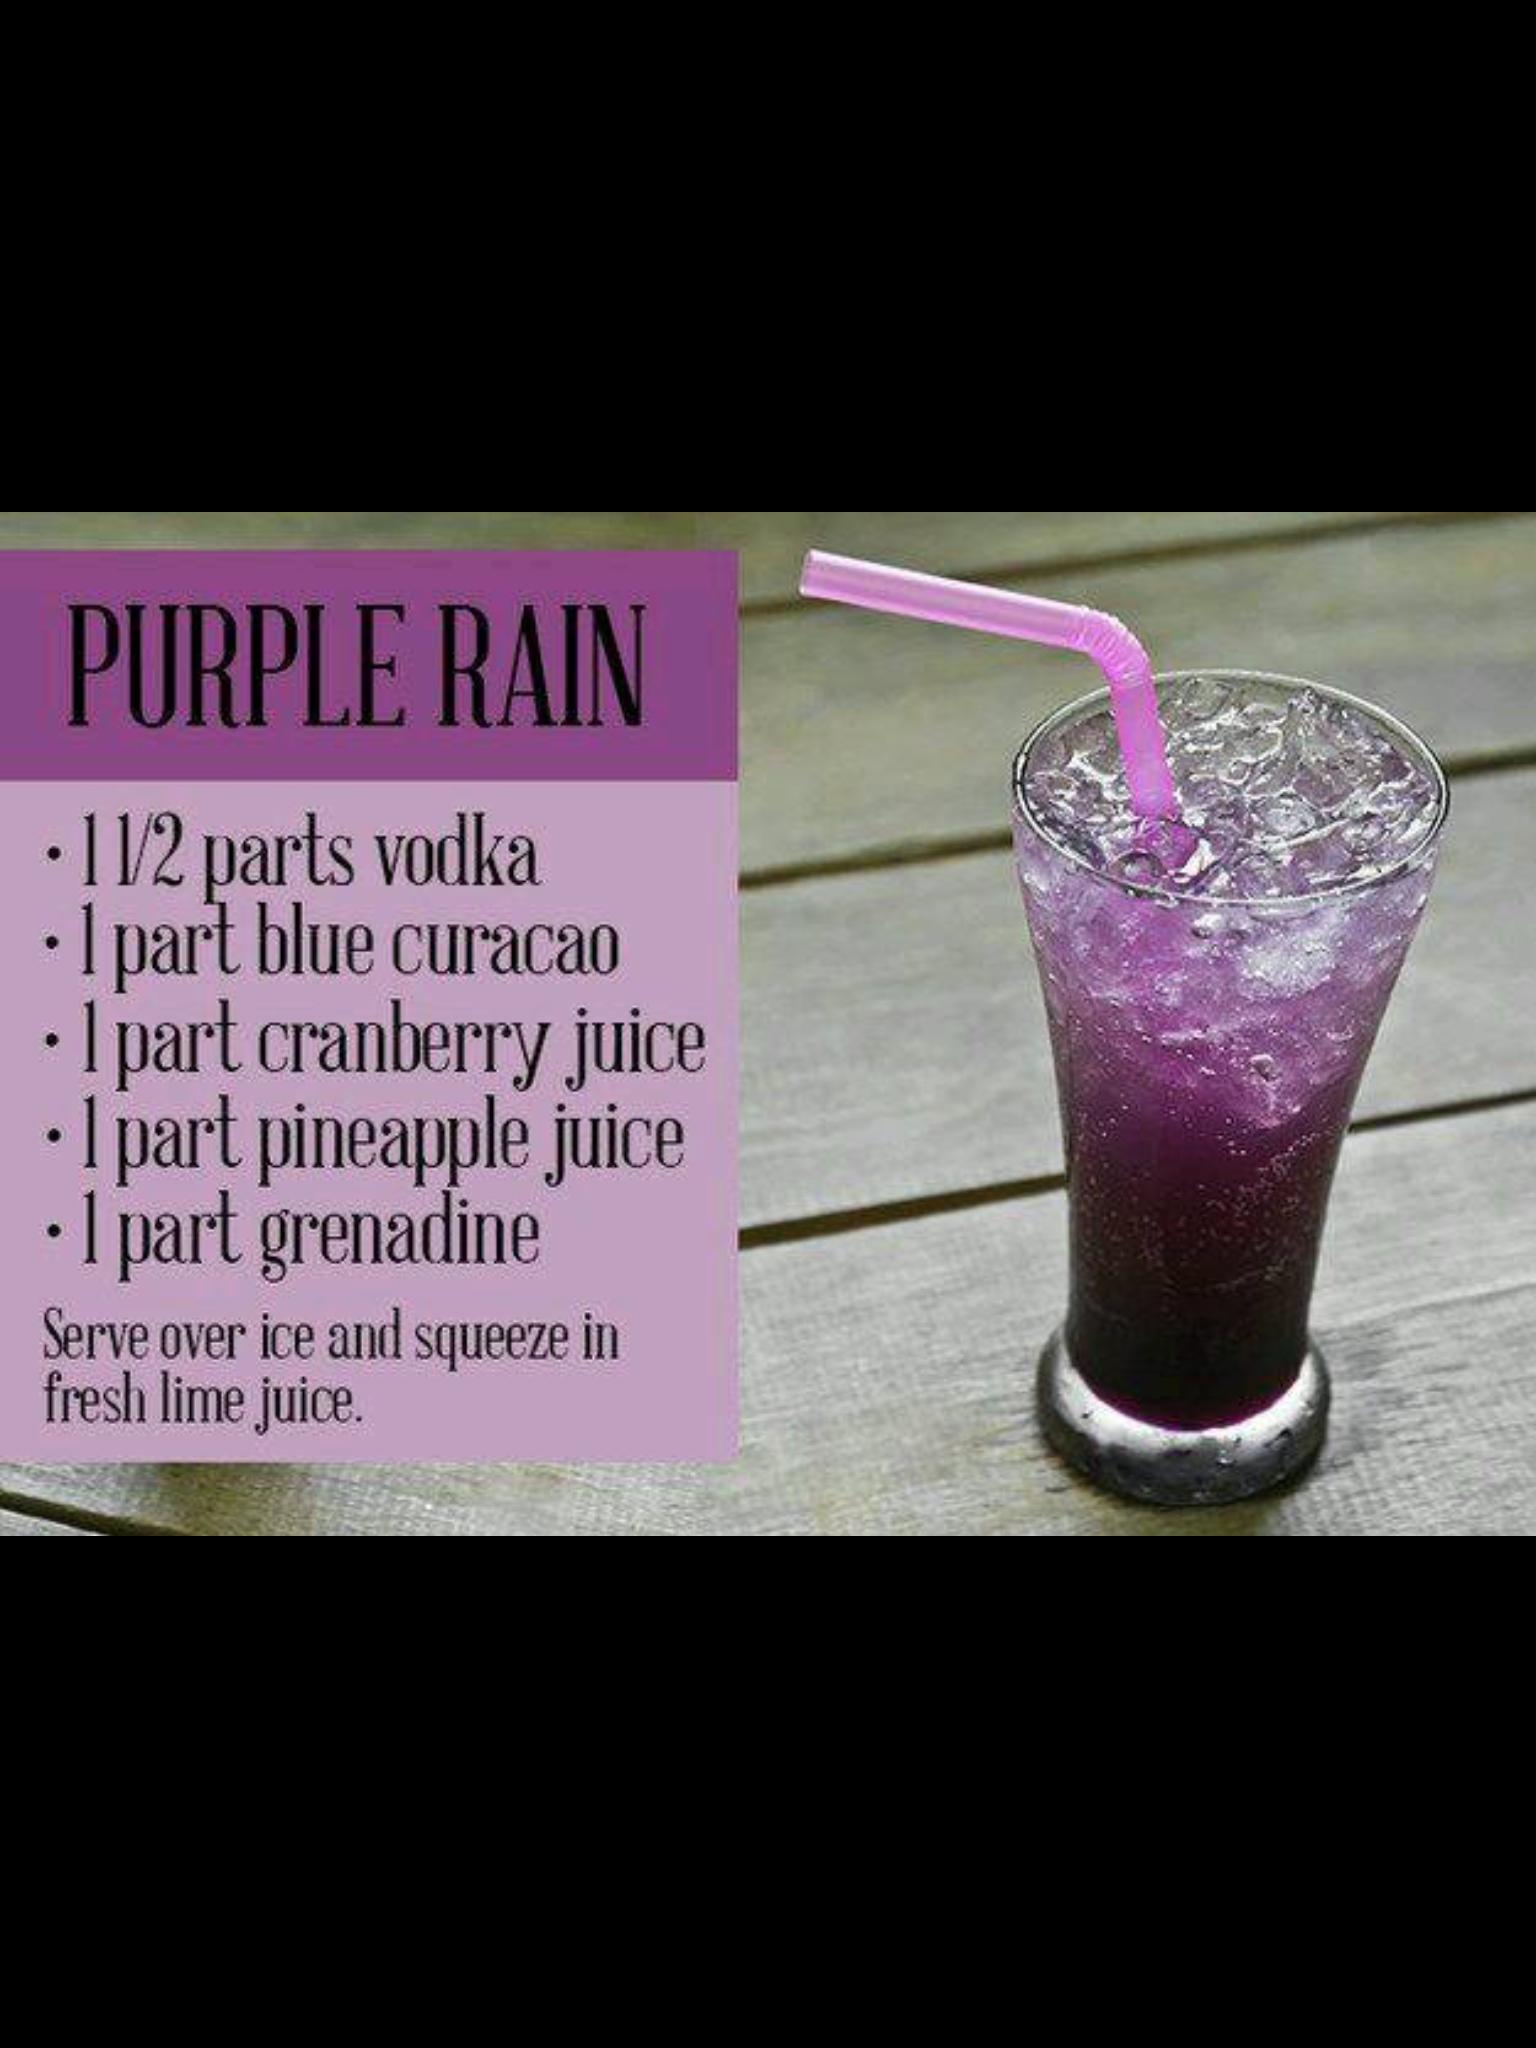 Purple Rain Alcohol Drink Recipes Vodka Cocktails Bar Drinks